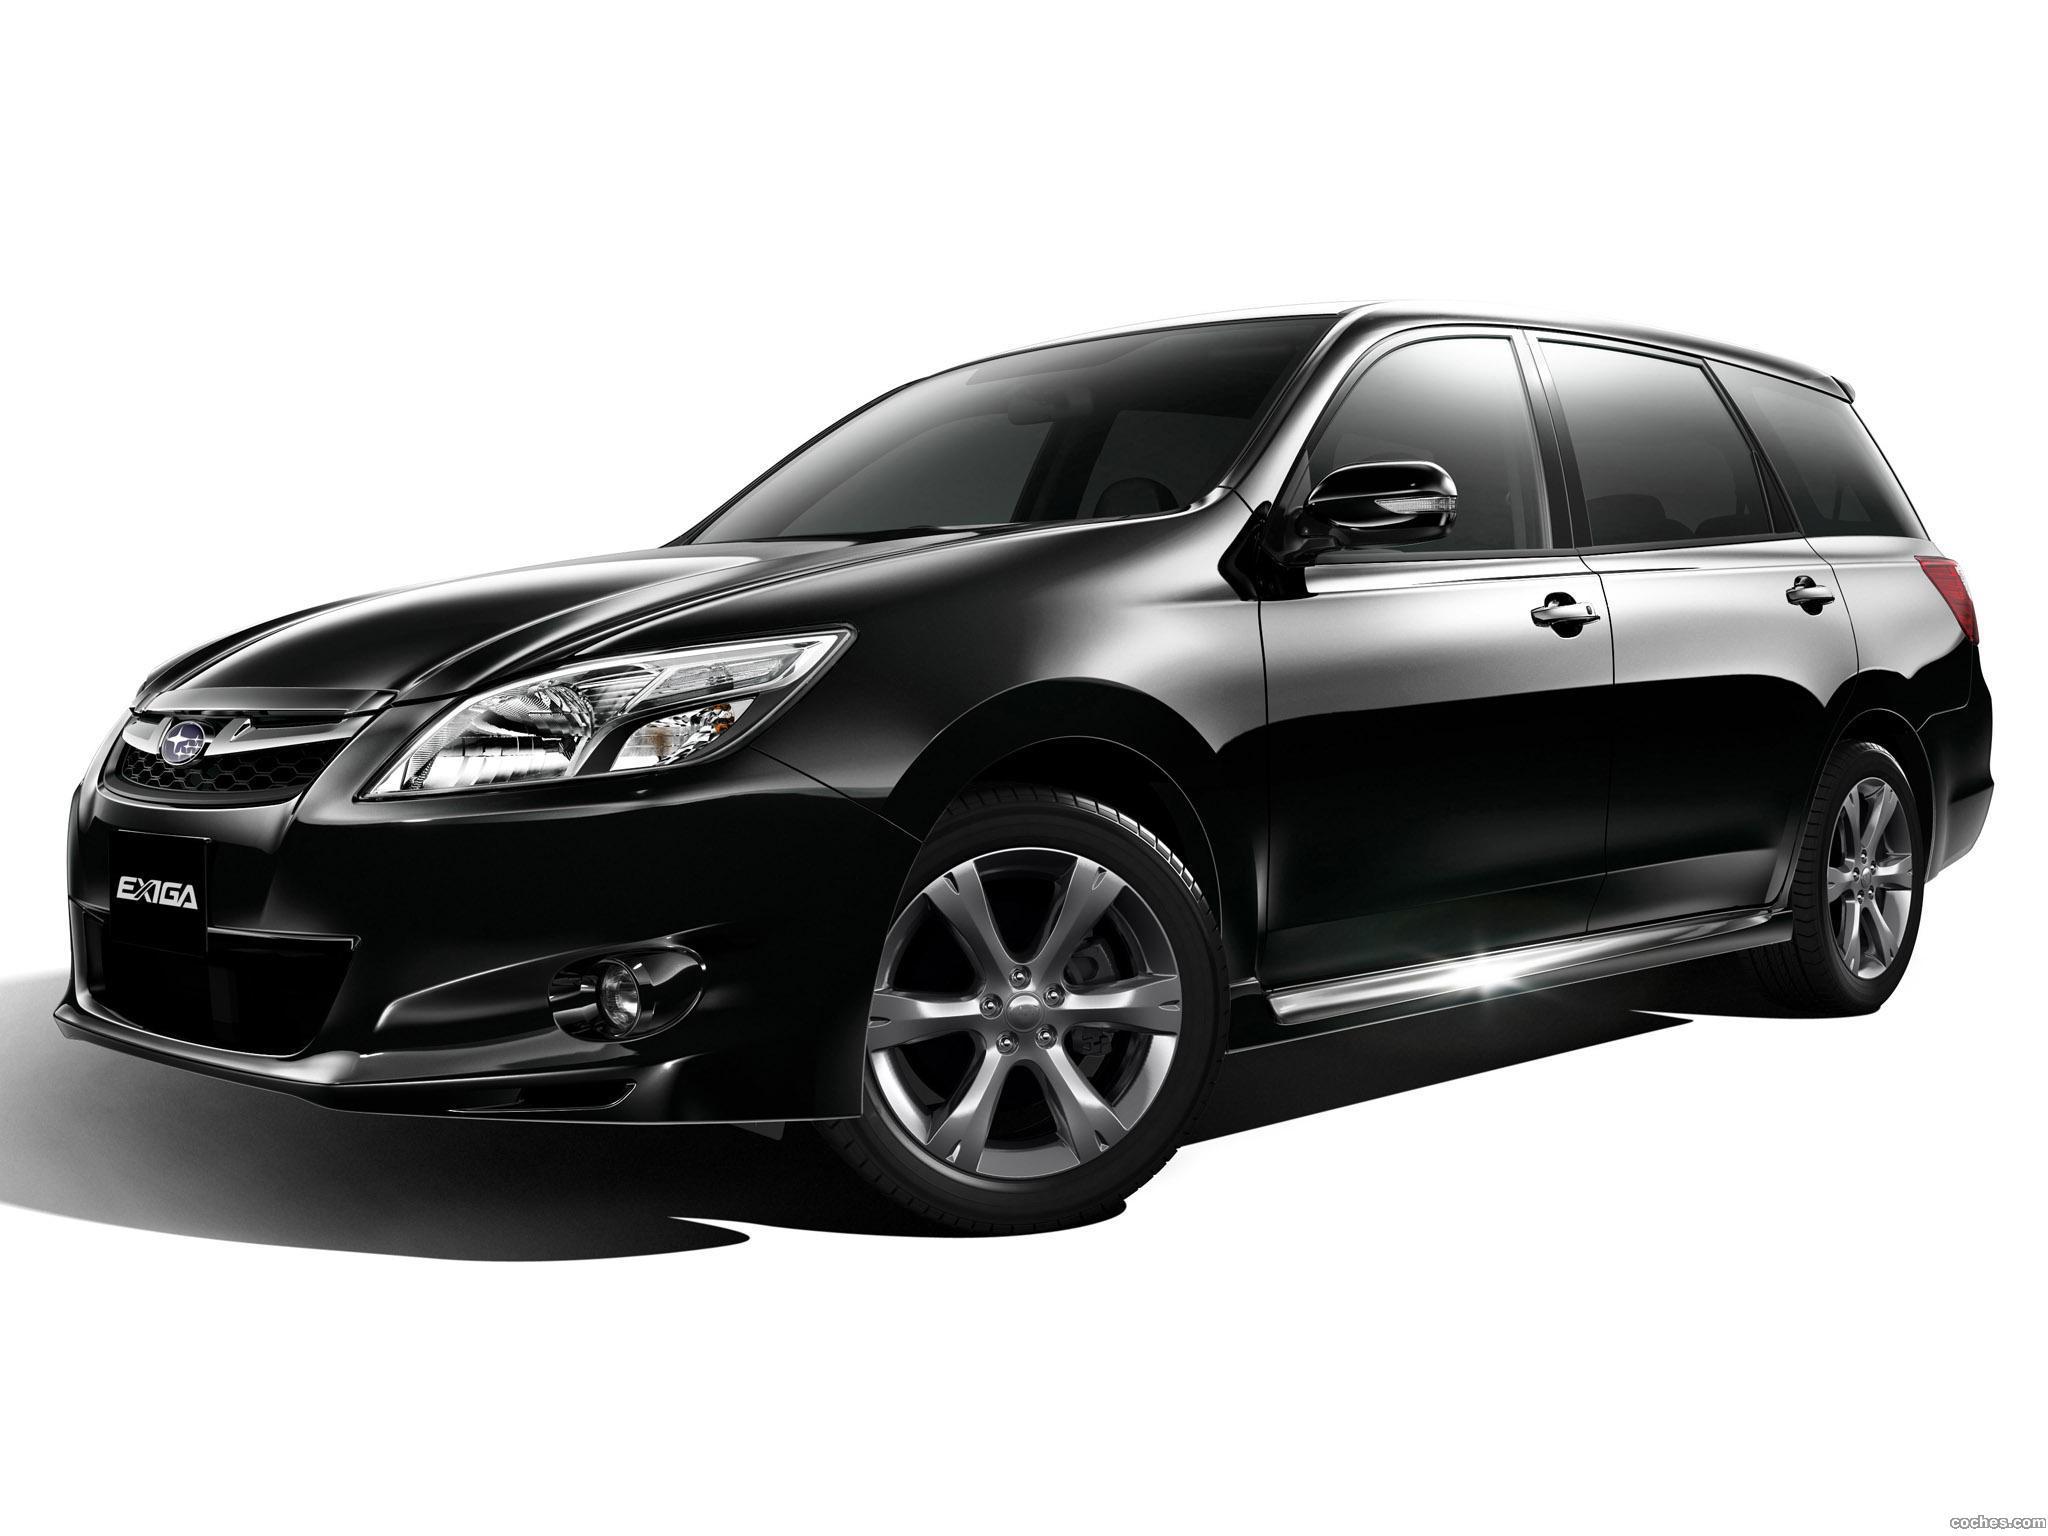 Foto 0 de Subaru Exiga Advantage Line  2011